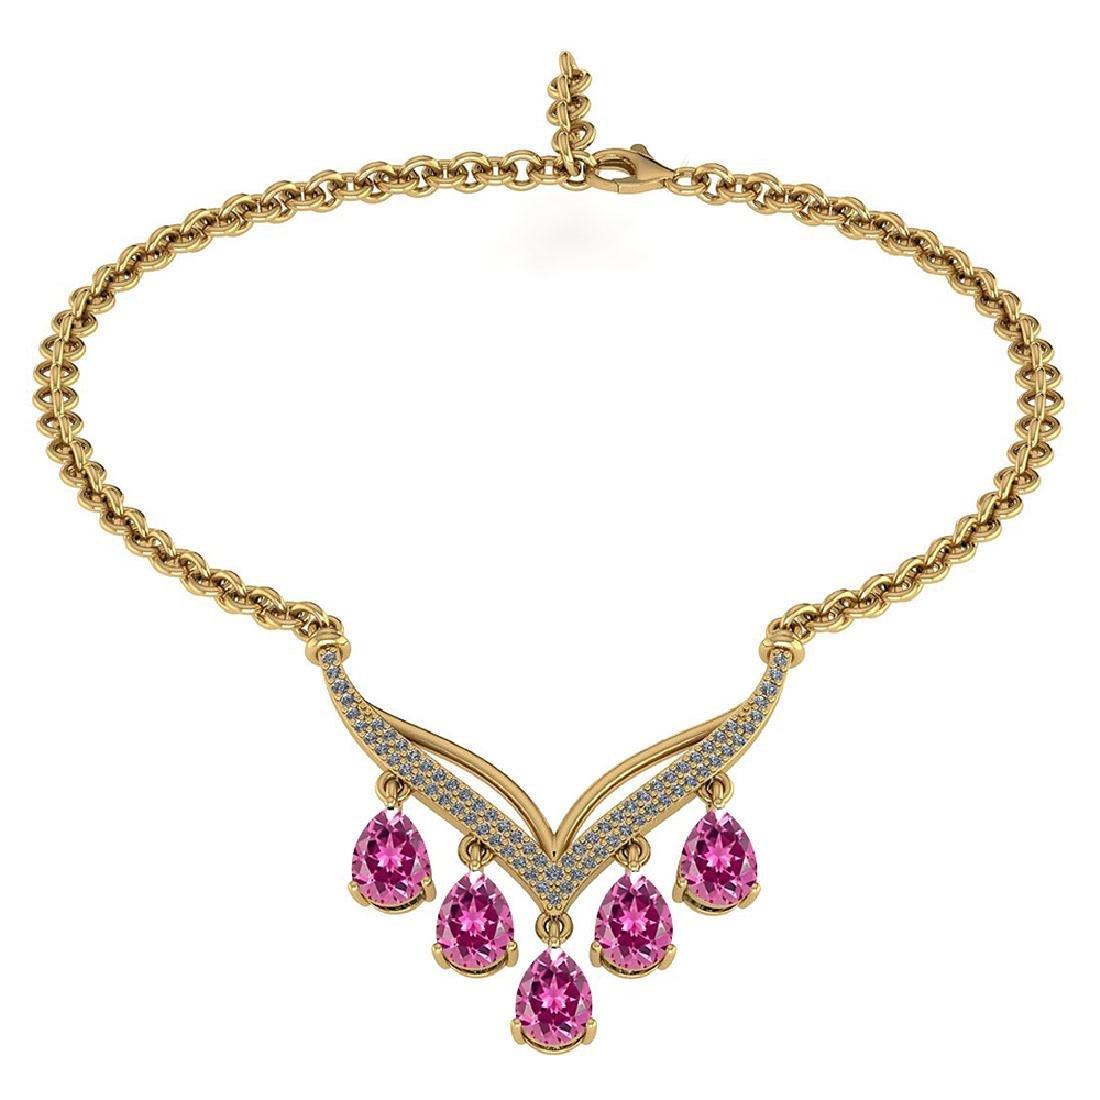 Certified 4.19 CTW Genuine Pink Tourmaline And Diamond